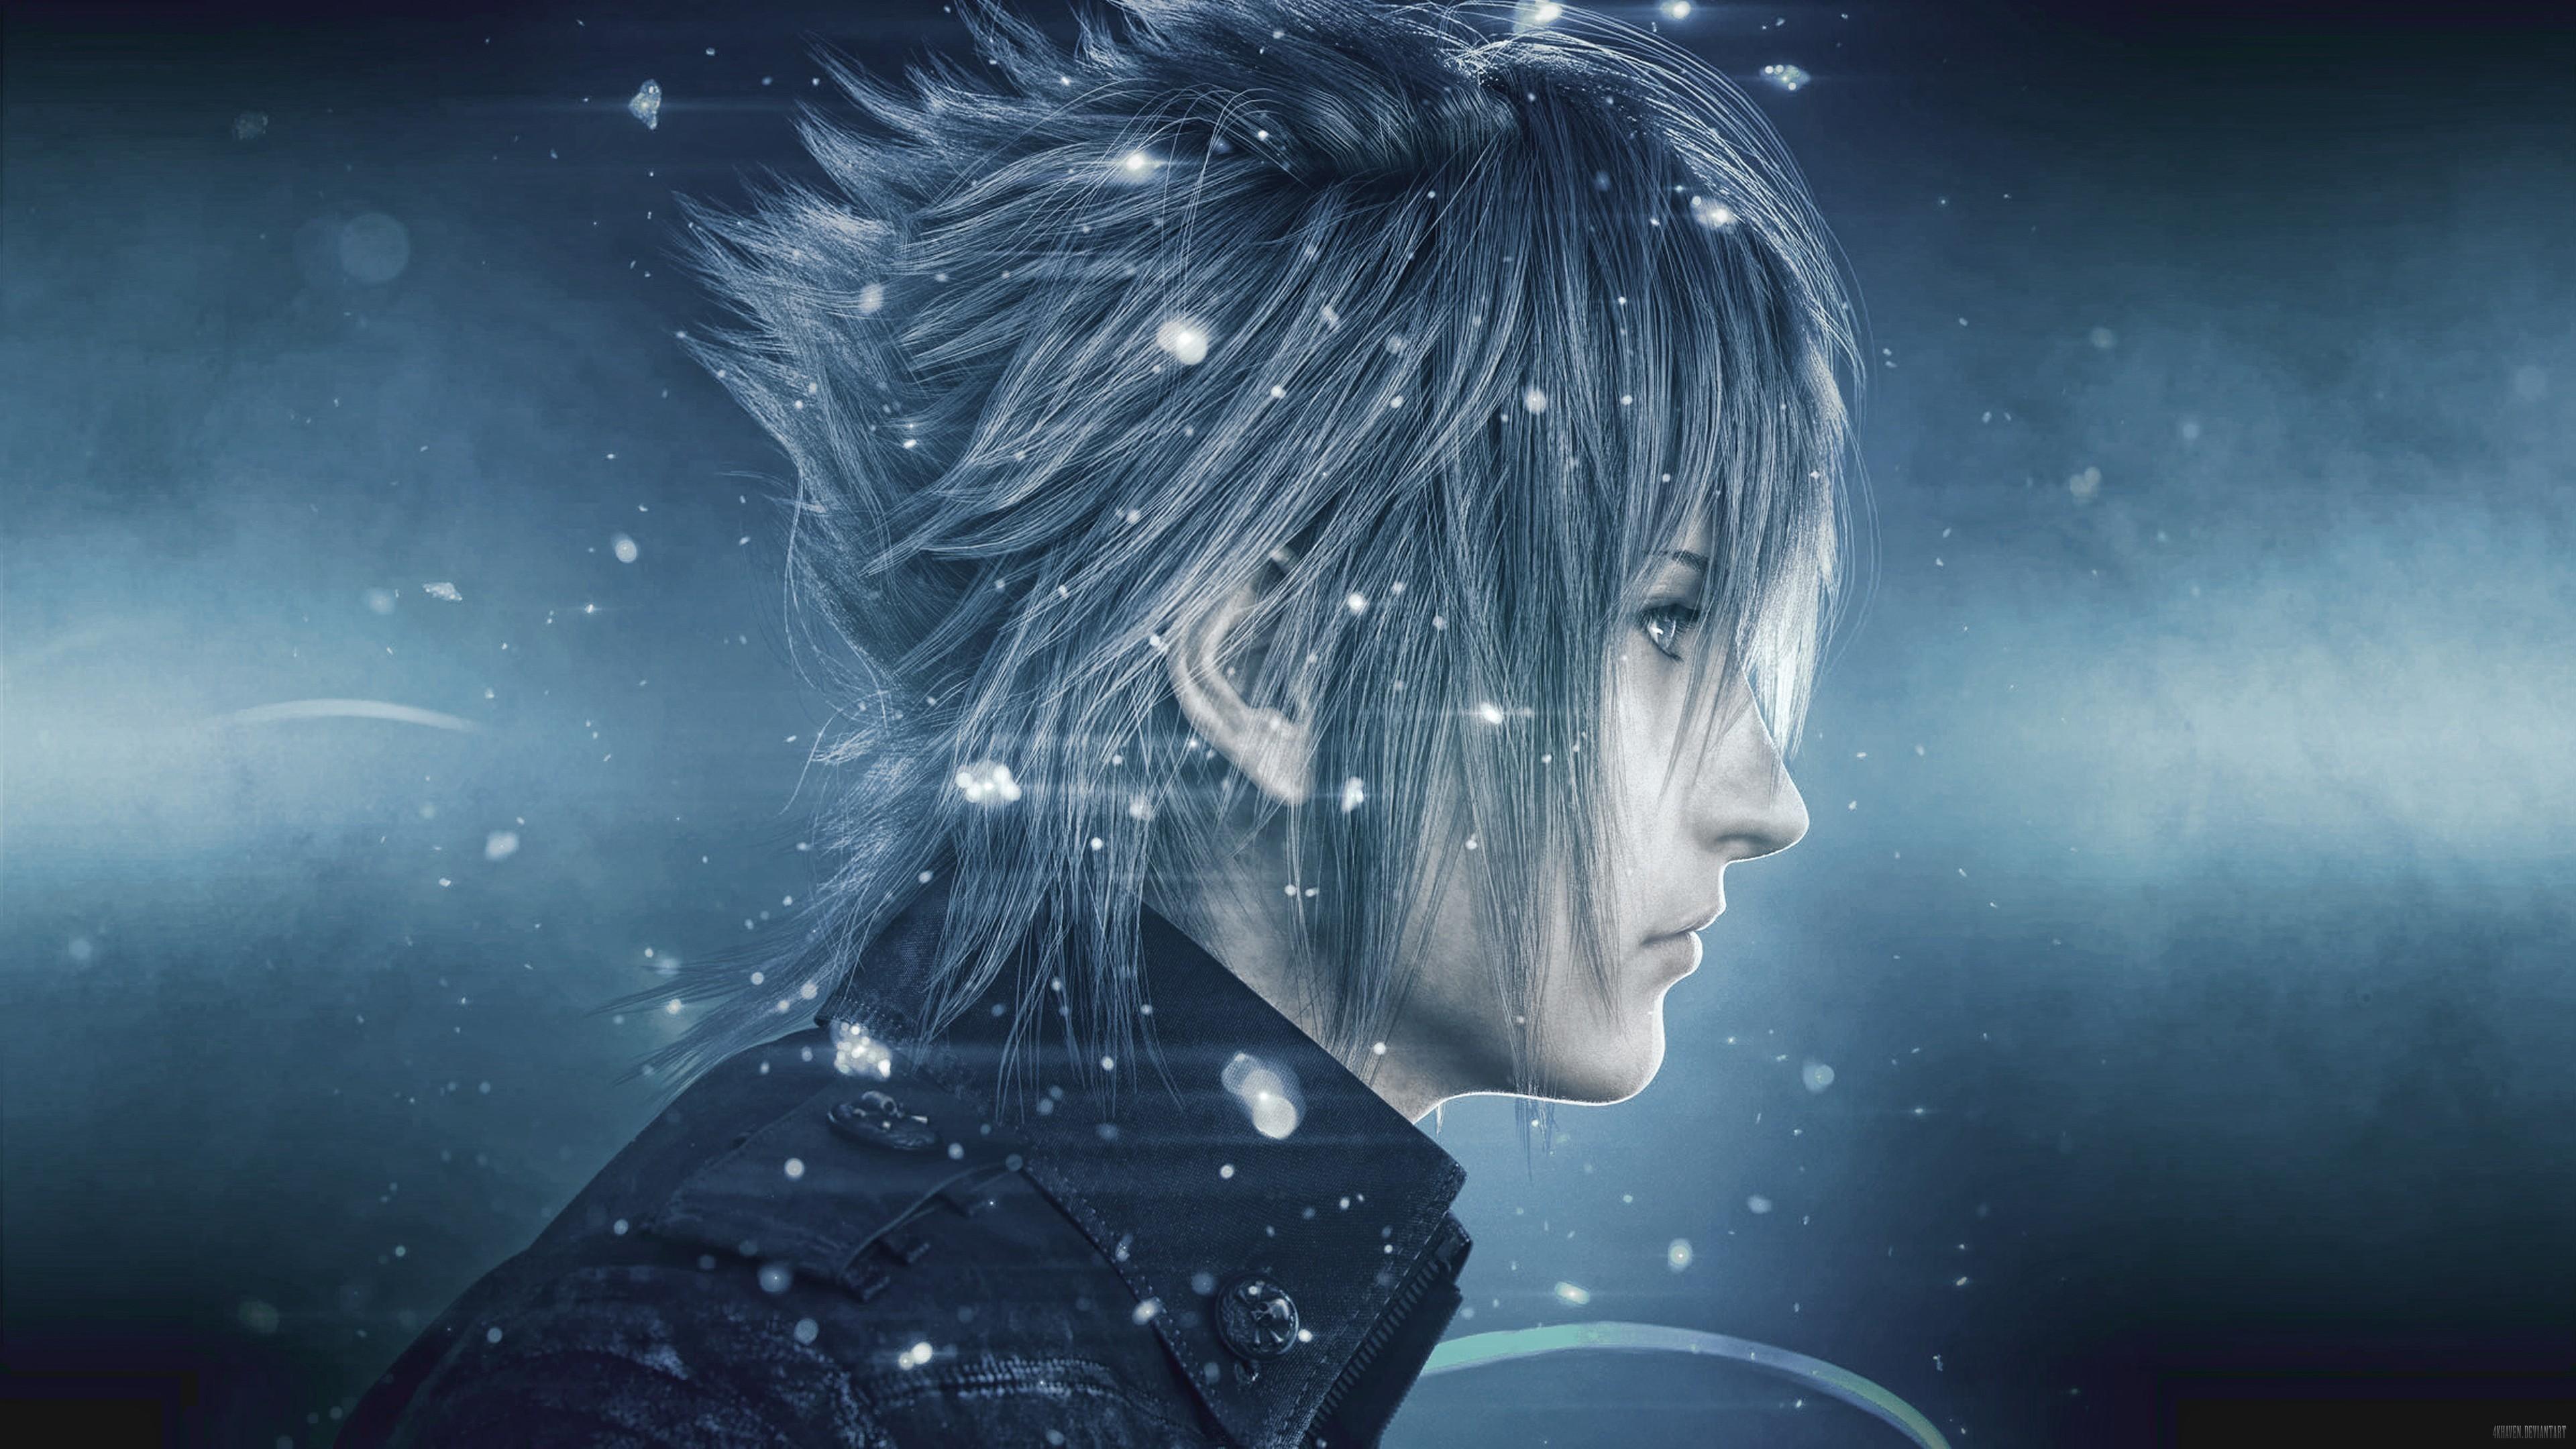 Aranea Highwind Final Fantasy Xv Hd Games 4k Wallpapers: Final Fantasy XV HD Wallpaper (81+ Images